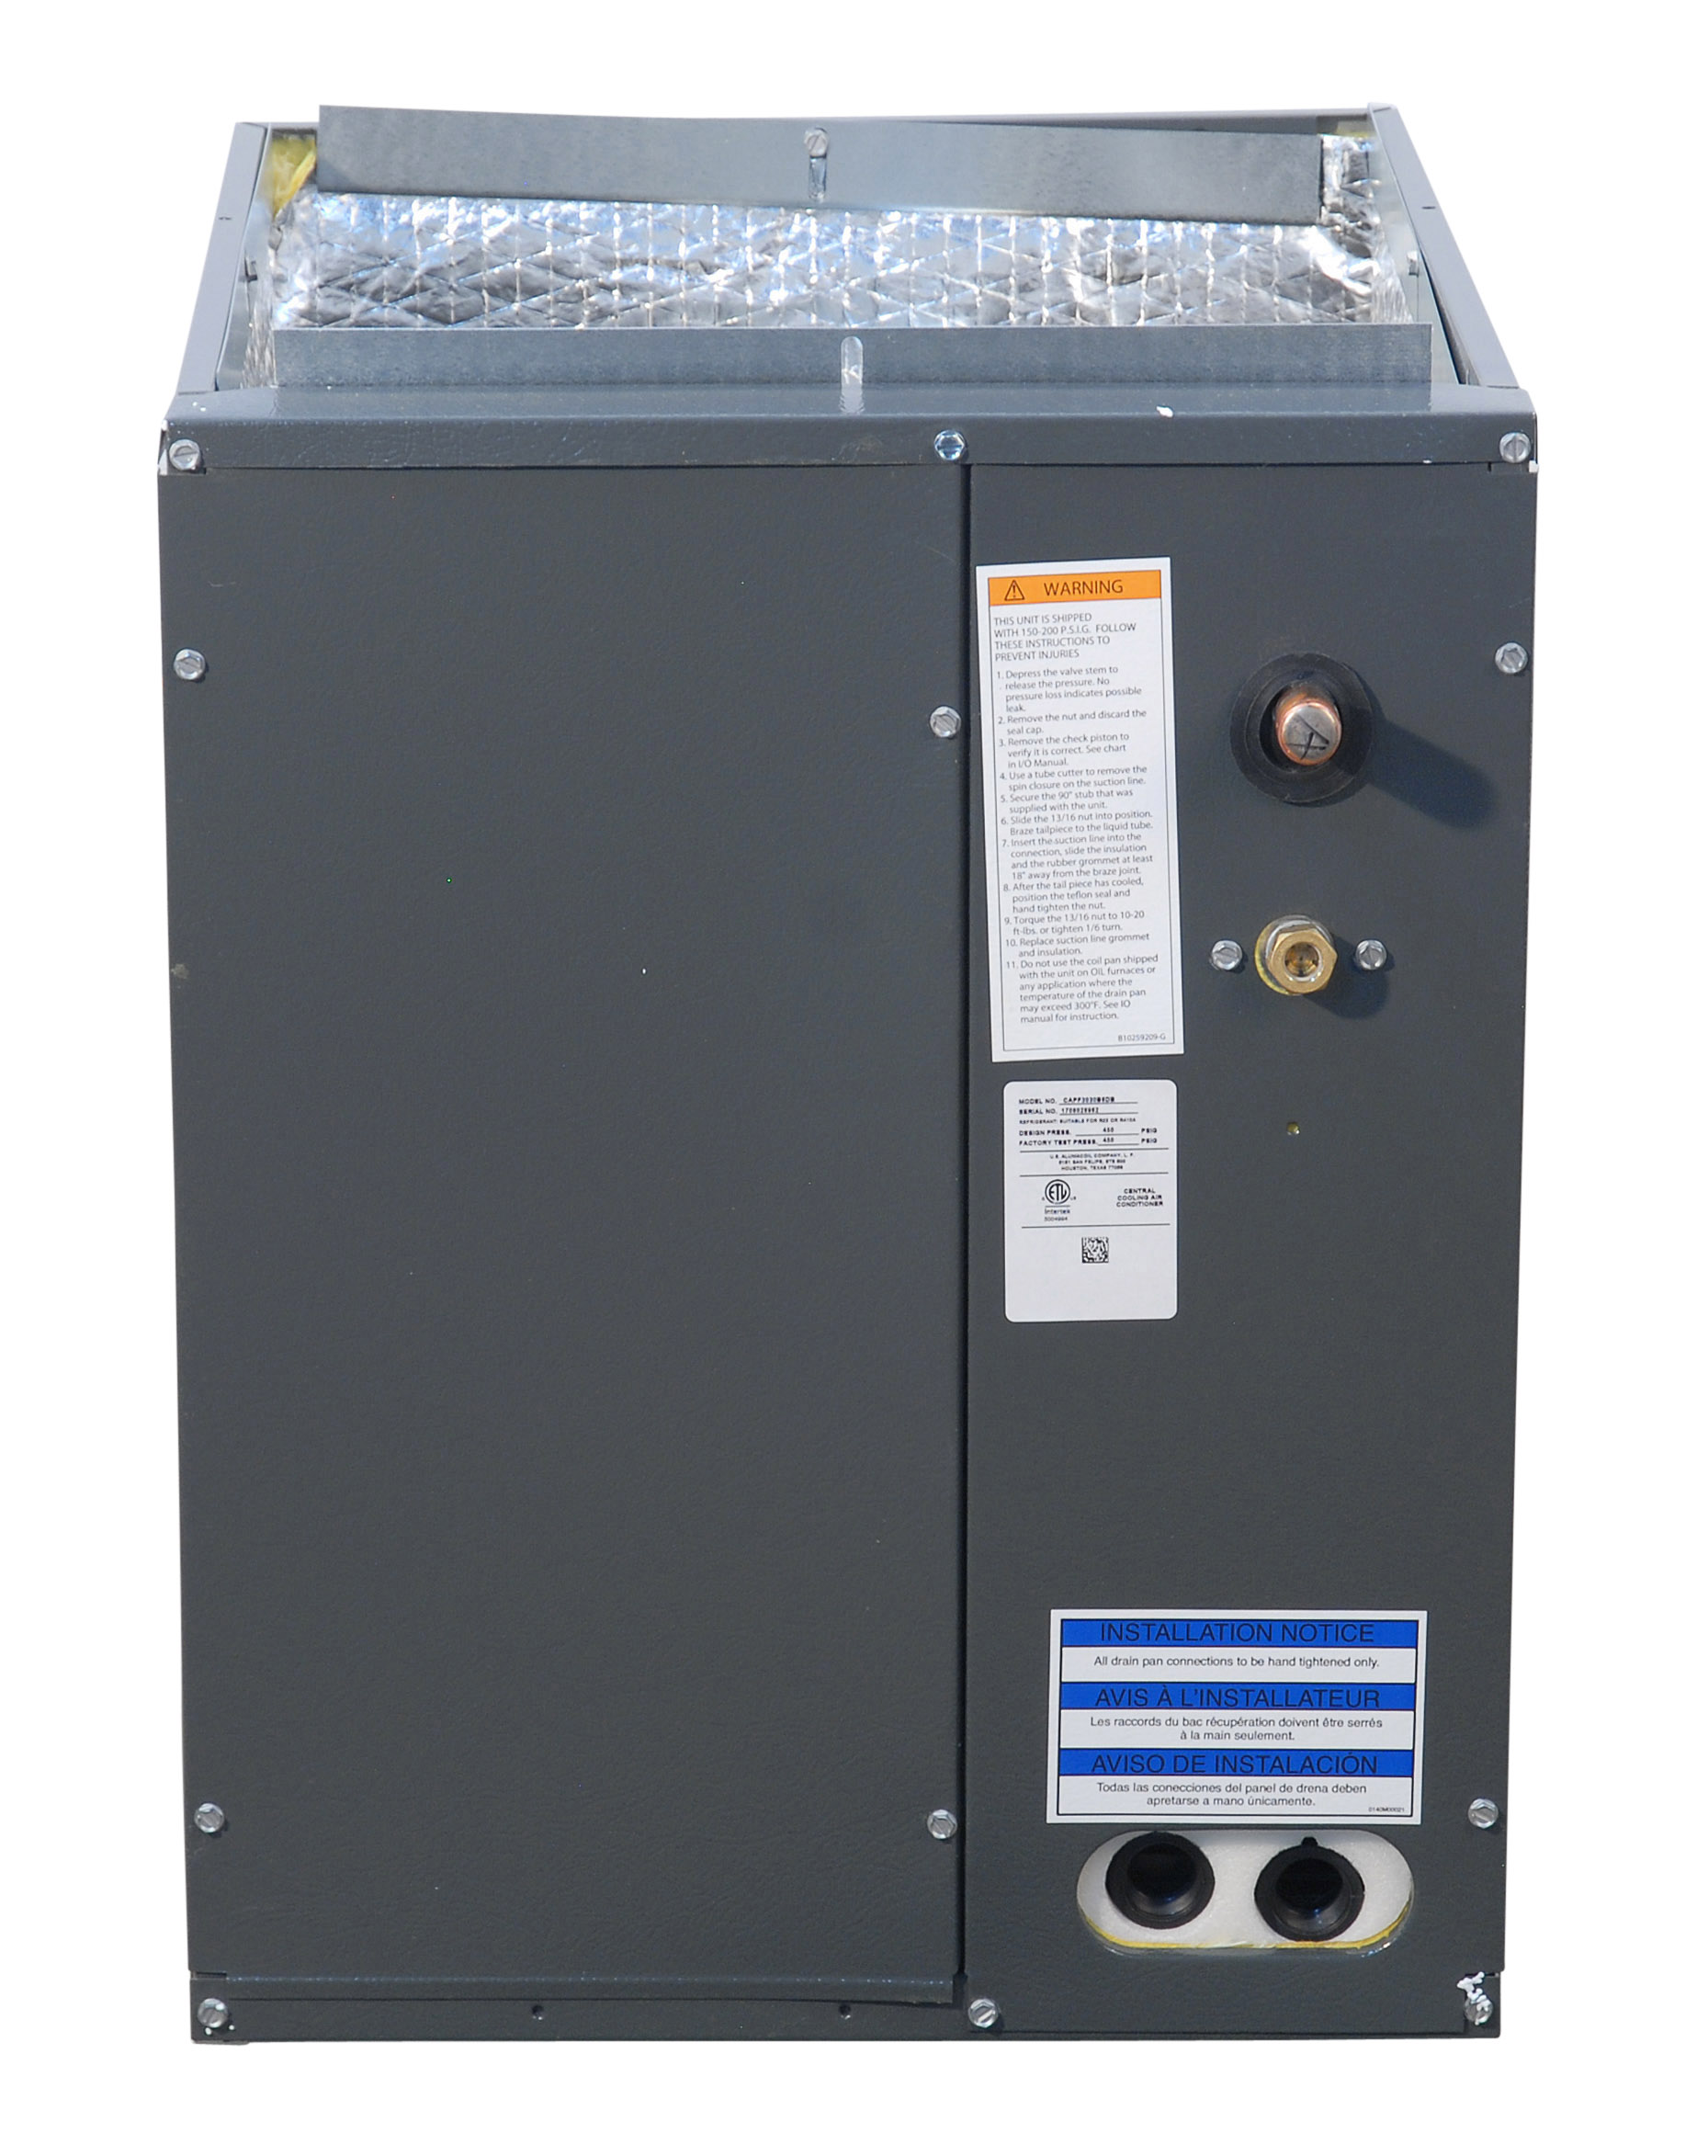 Goodman 3 to 3 5 Ton CAPF3642C6 Painted Cased Evaporator Coil